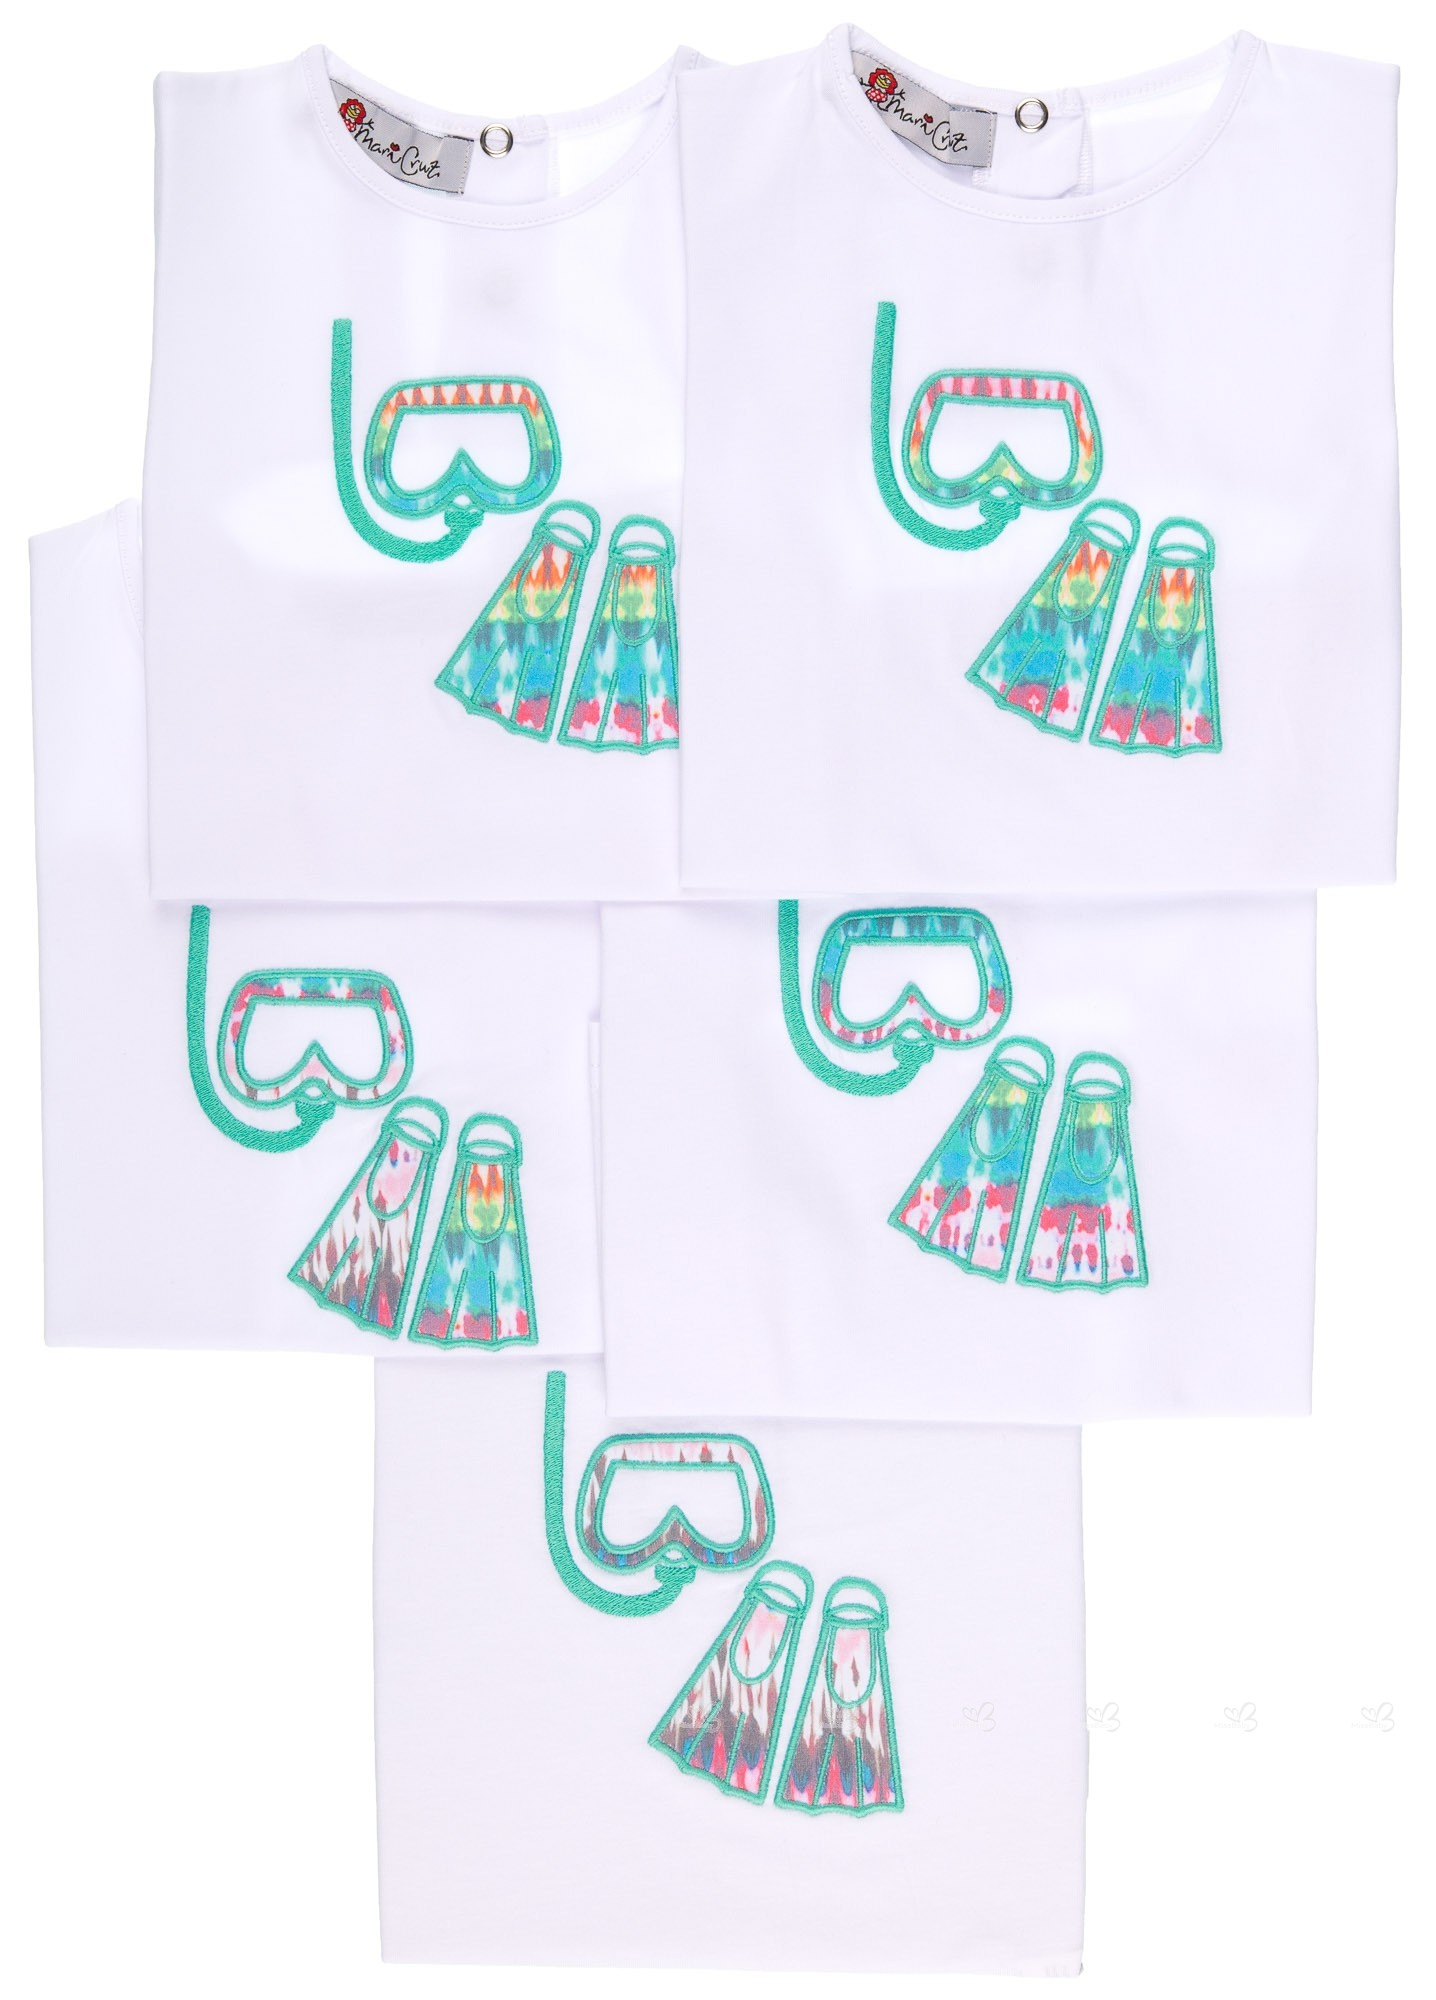 Agua De Verde Con Camiseta Bordadas Gafasamp; Aletas Bucear En Niño Blanca n0wONyvm8